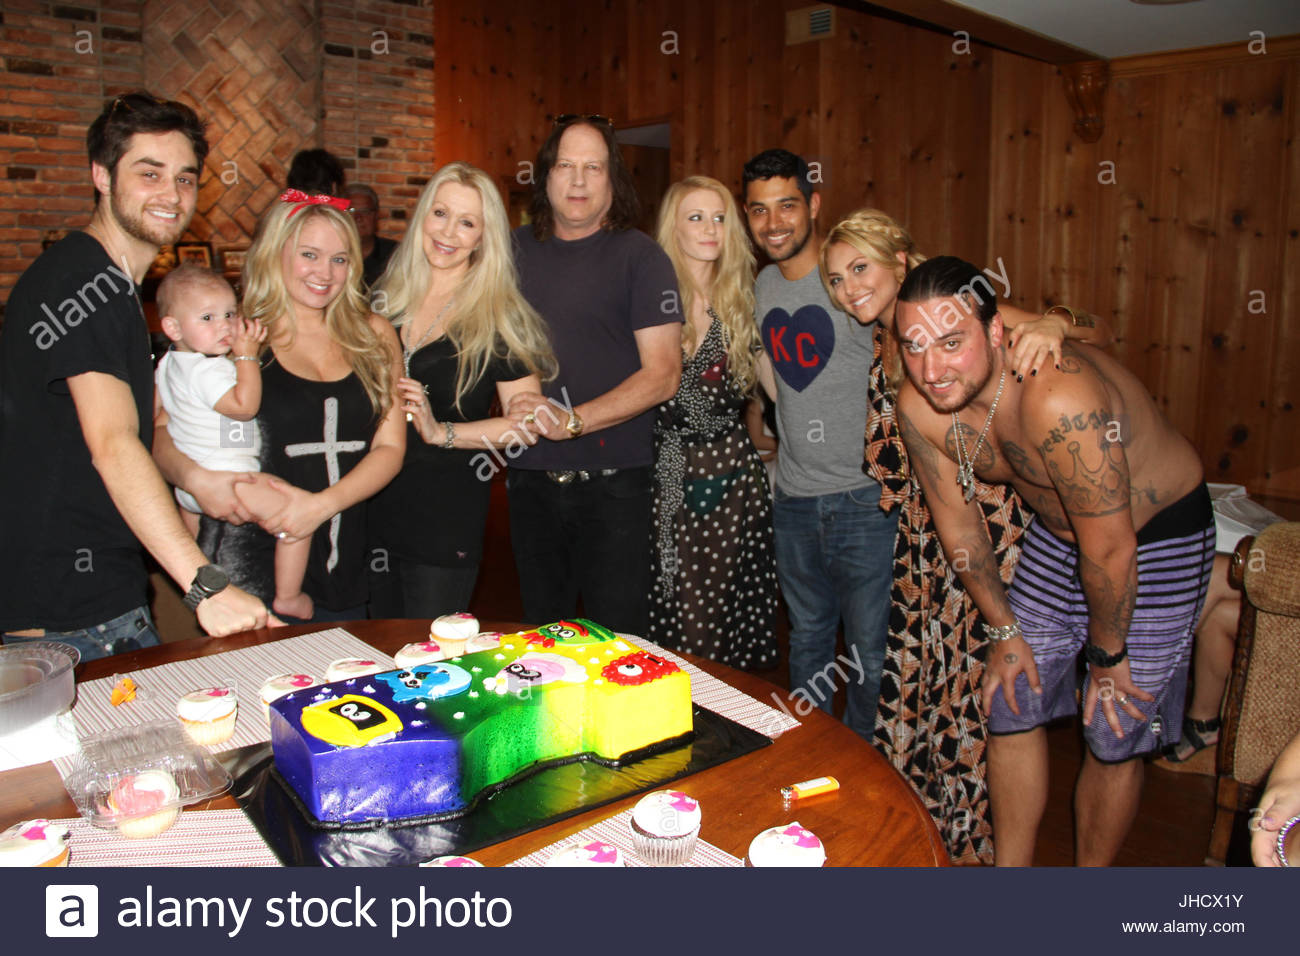 Nicole Eggert born January 13, 1972 (age 46),Harley Jane Kozak XXX pic Gloria Blondell,Kiki Fatmala